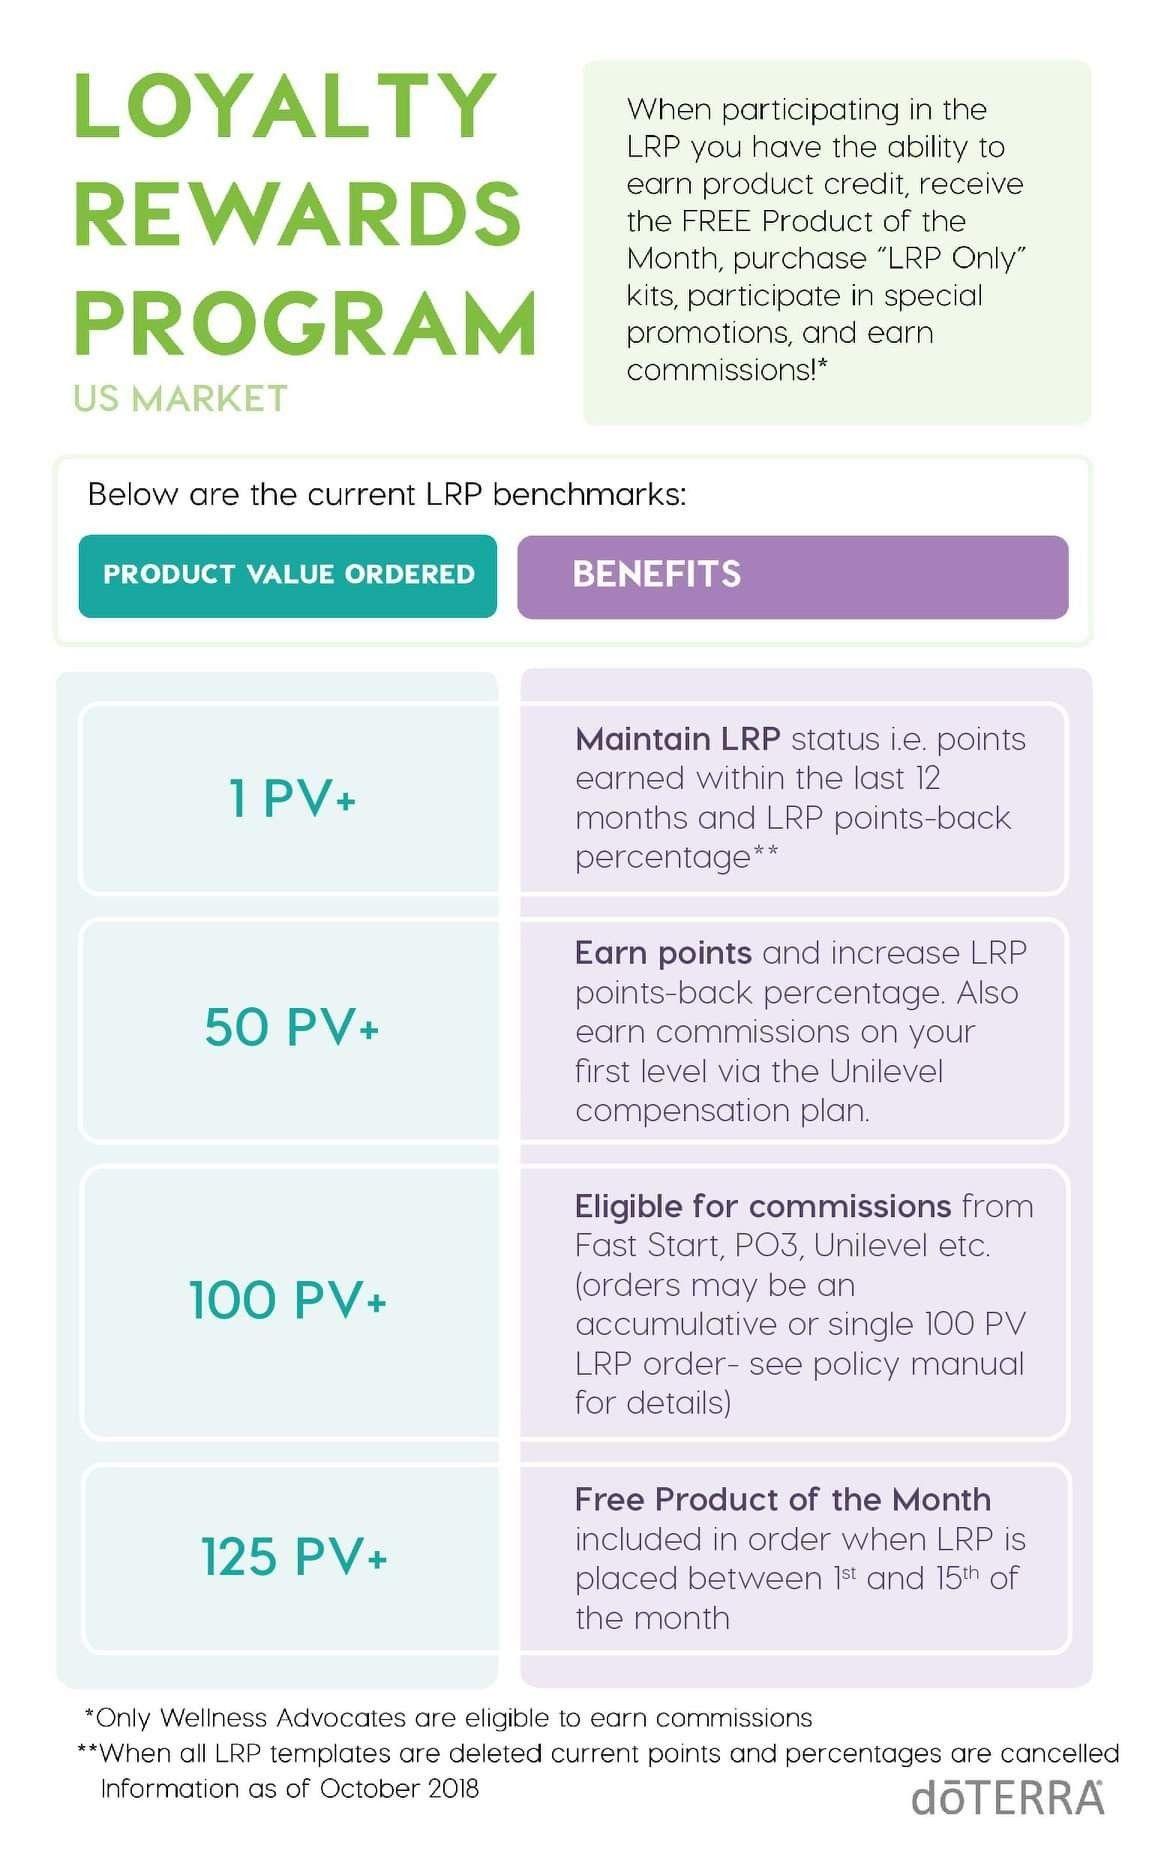 Loyalty Rewards Program Doterra business, Loyalty